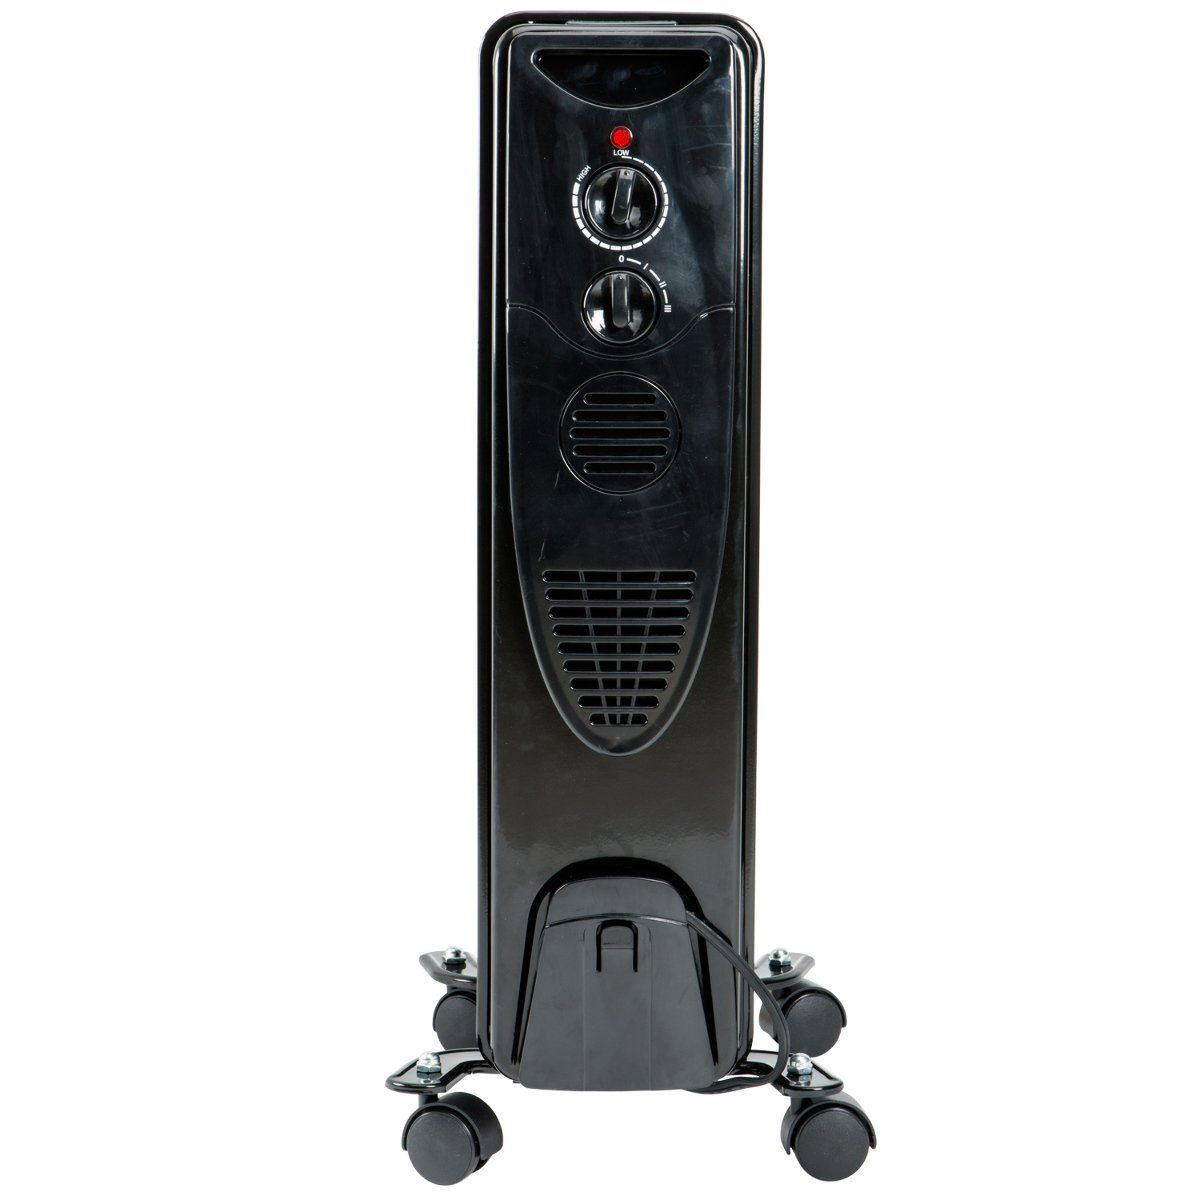 1500 Watt Oil Filled Radiator Heater Black *** Check out